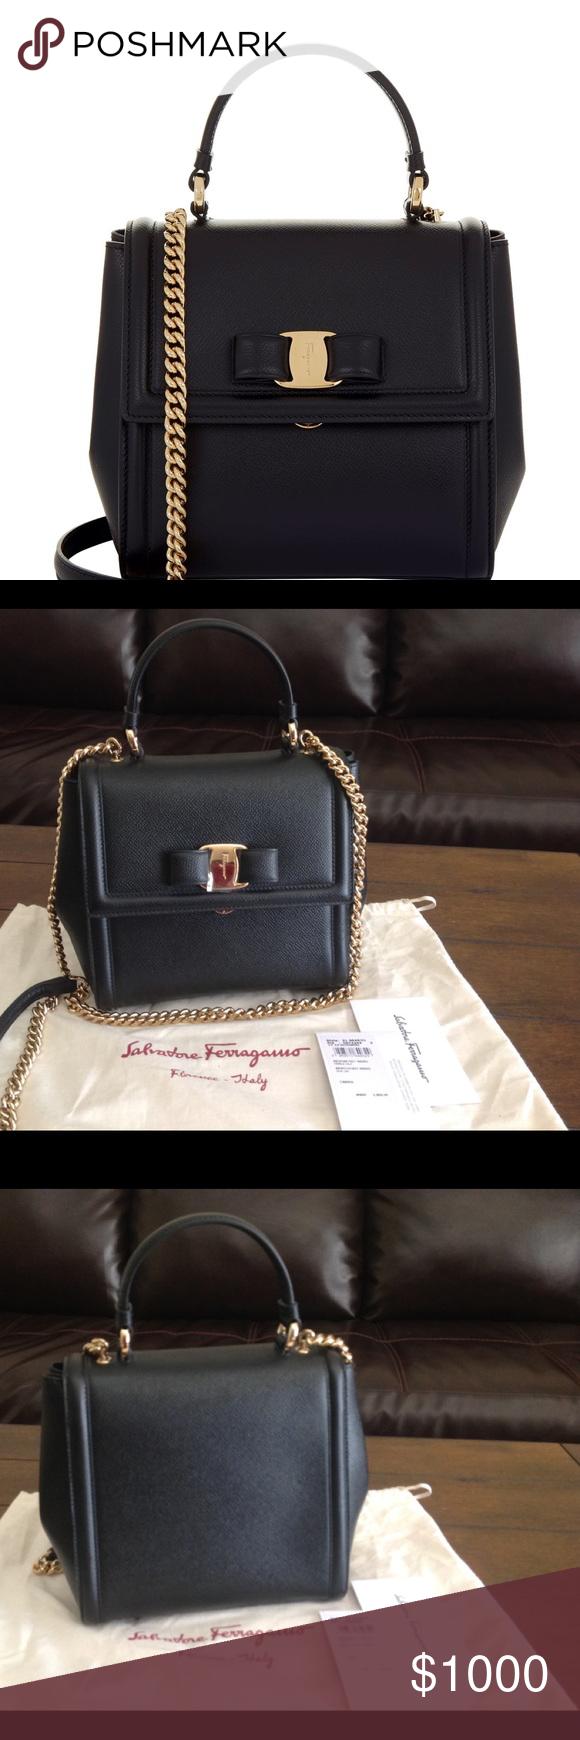 f474a7f43e Salvatore Ferragamo Carrie small bag Salvatore Ferragamo saffiano leather  satchel bag. Golden hardware. Flat